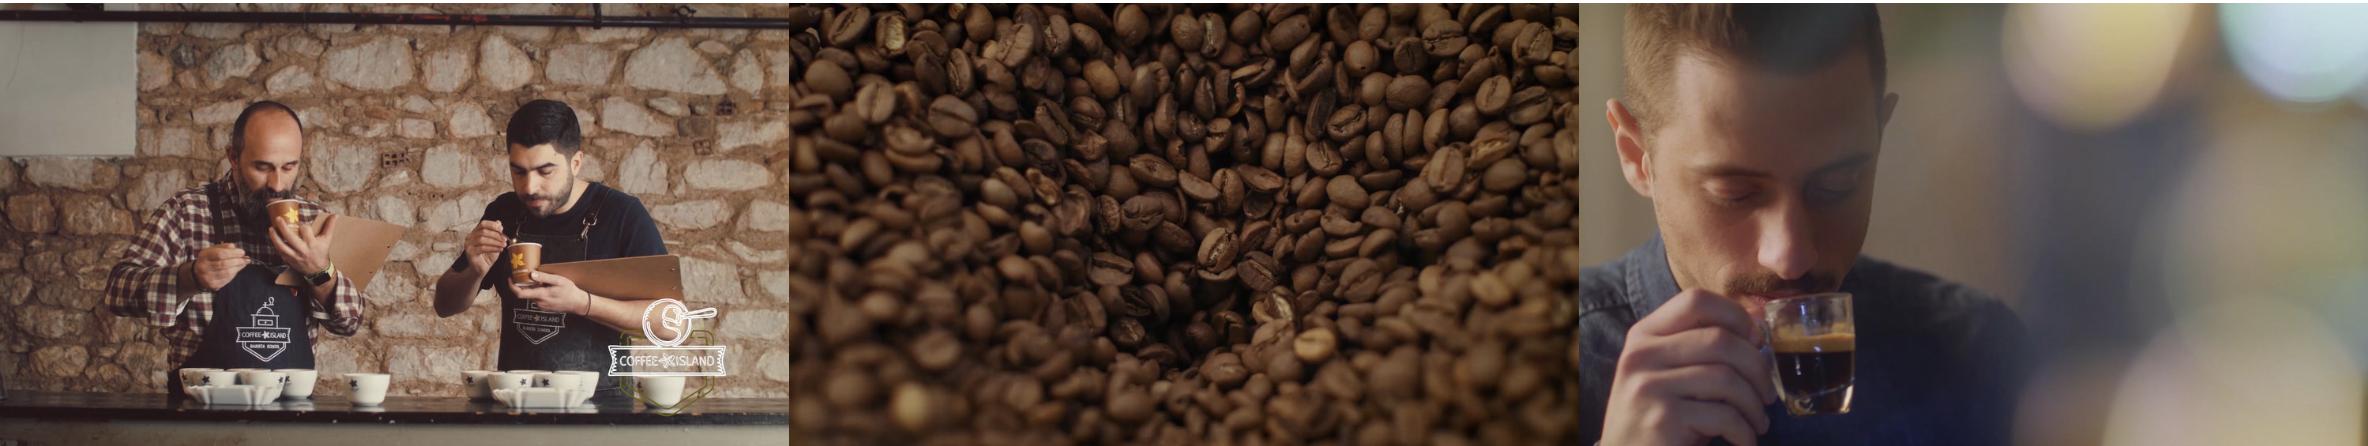 COFFEE ISLAND CAMPUS PROMO